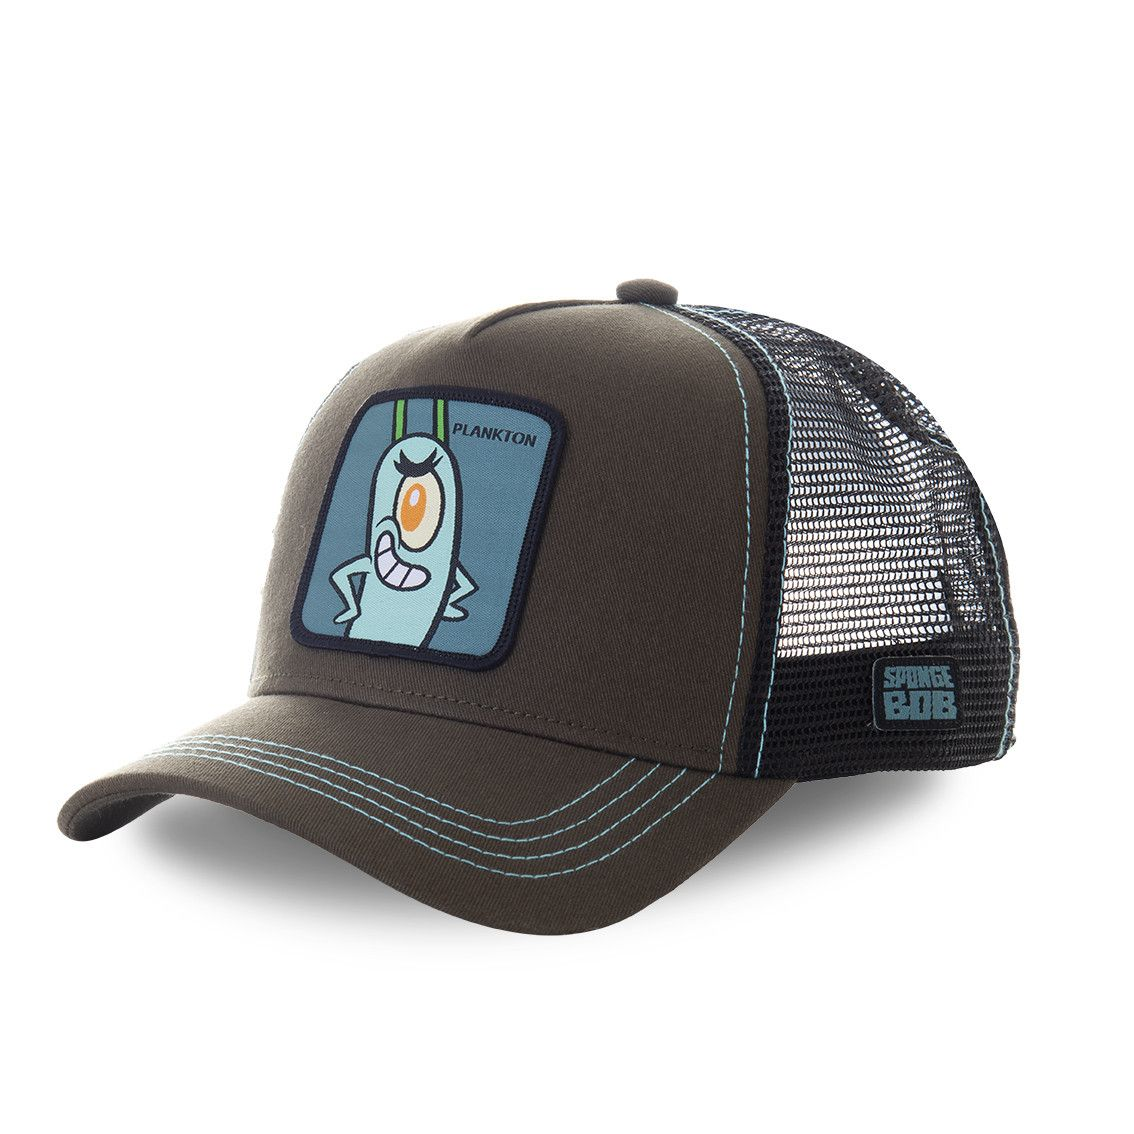 Casquette trucker capslab bob l'éponge plankton